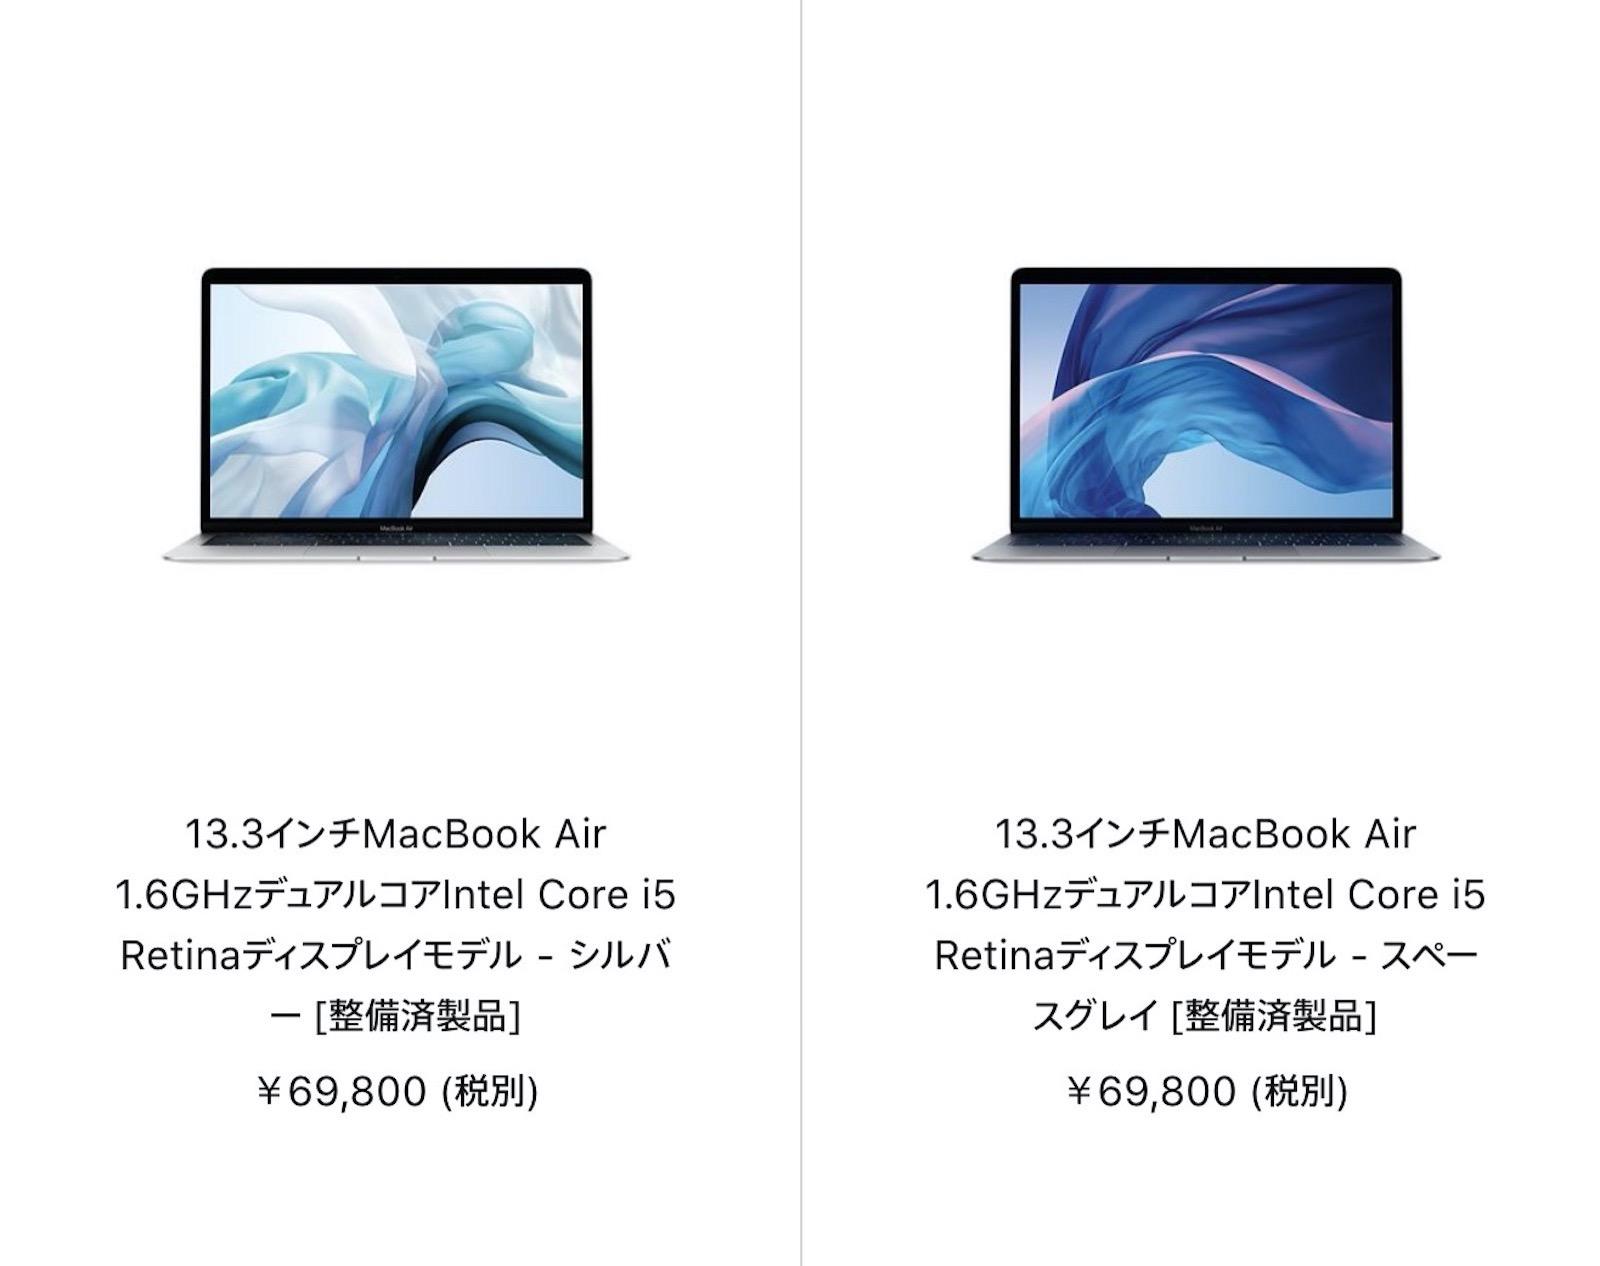 Macbook air 2019 refurbished